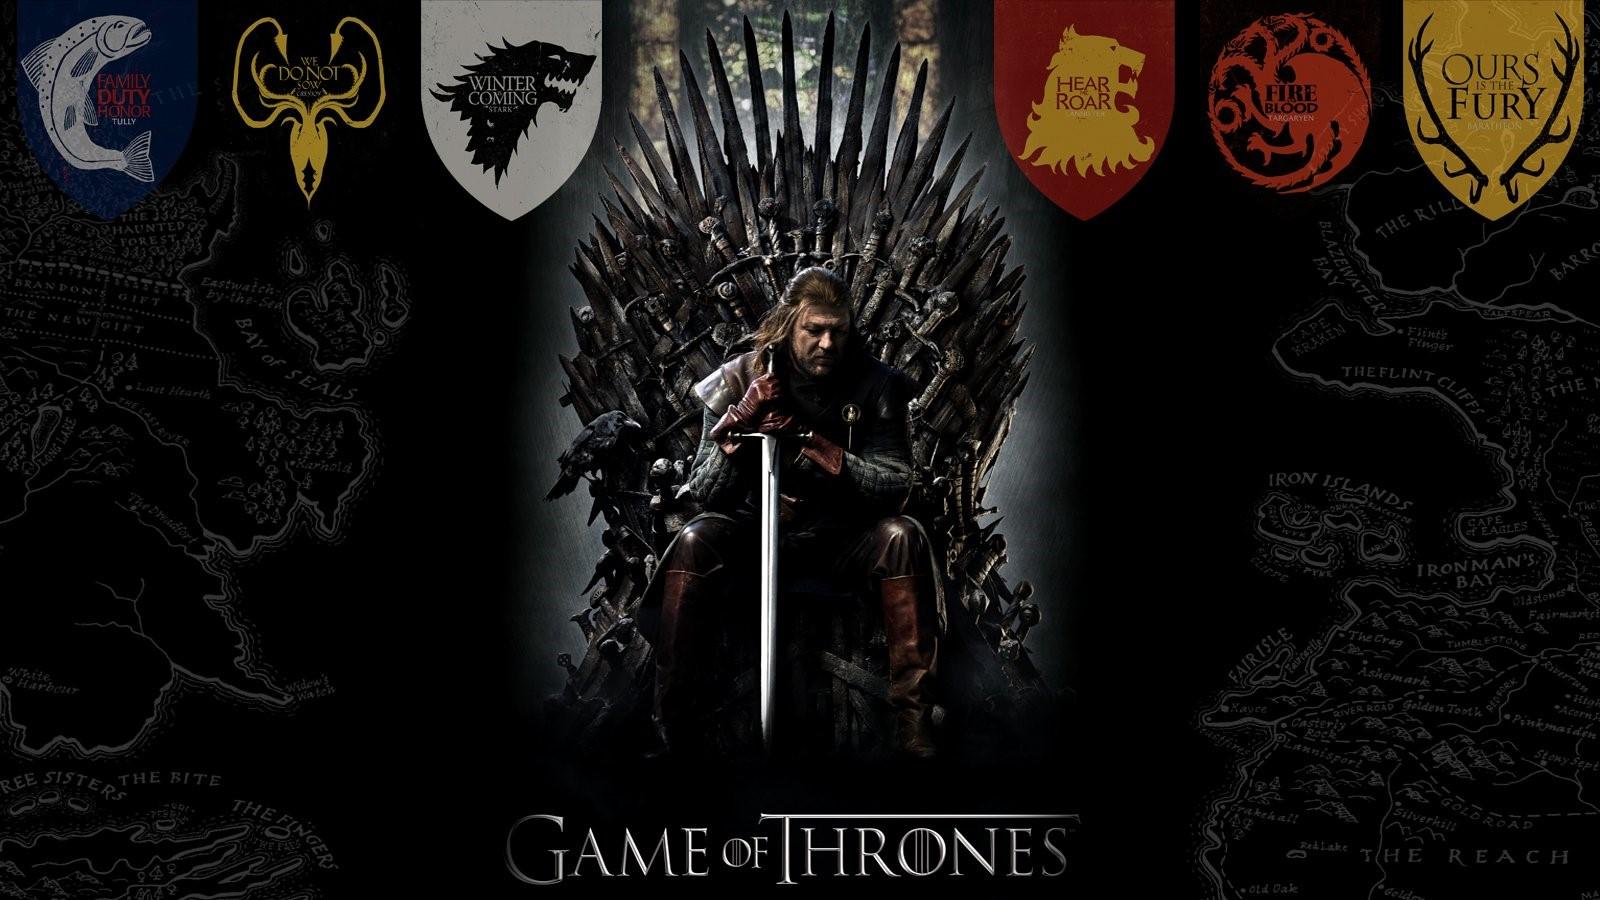 Game of thrones uhd duvar kağıdı